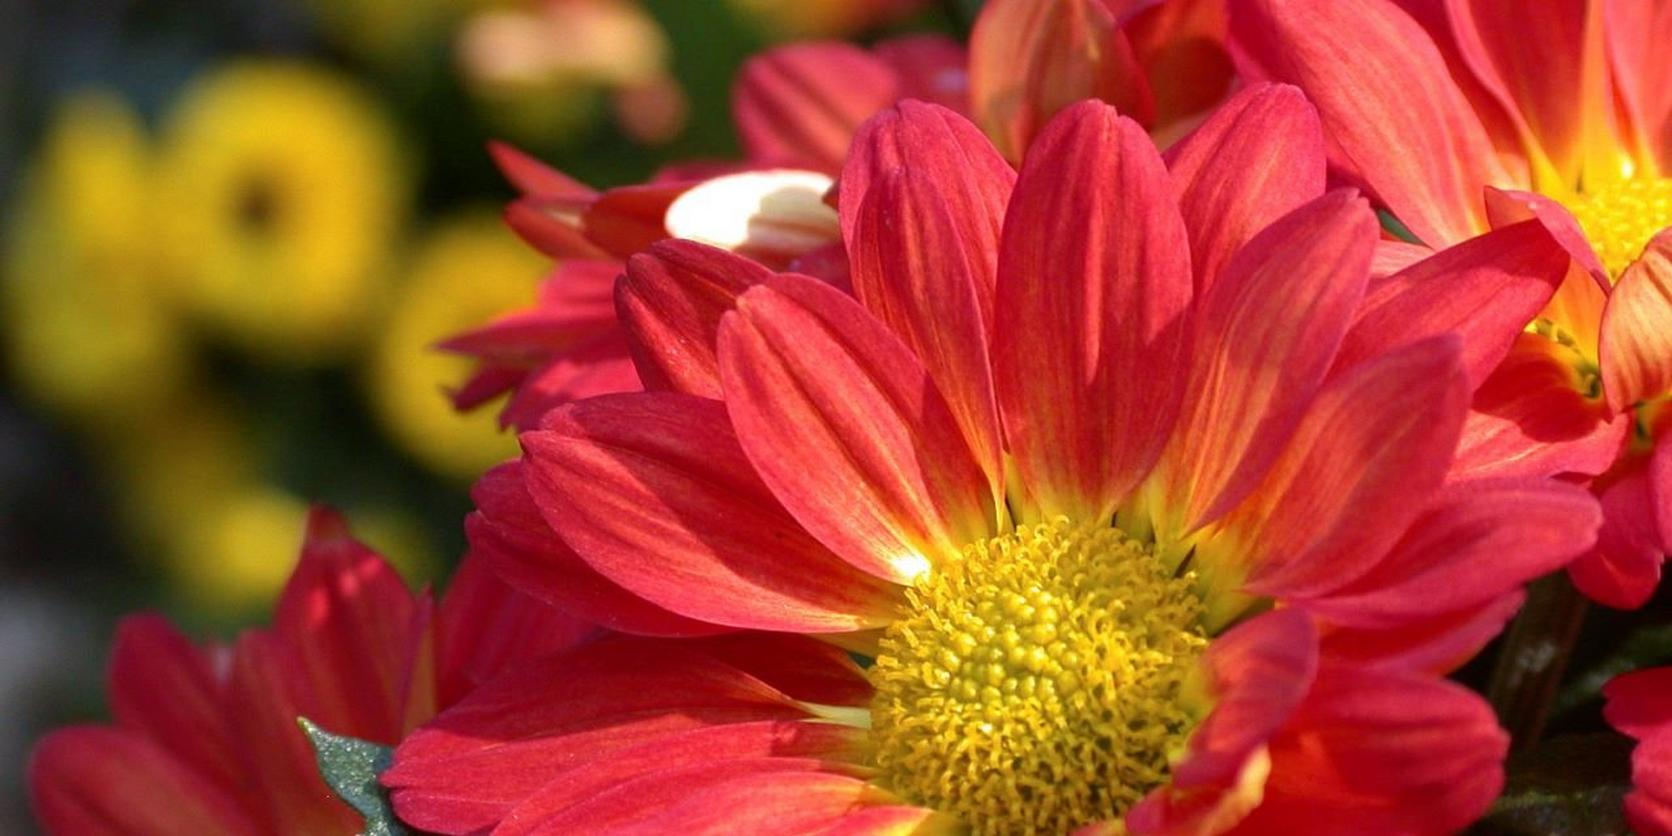 Red-Chrysanthemum